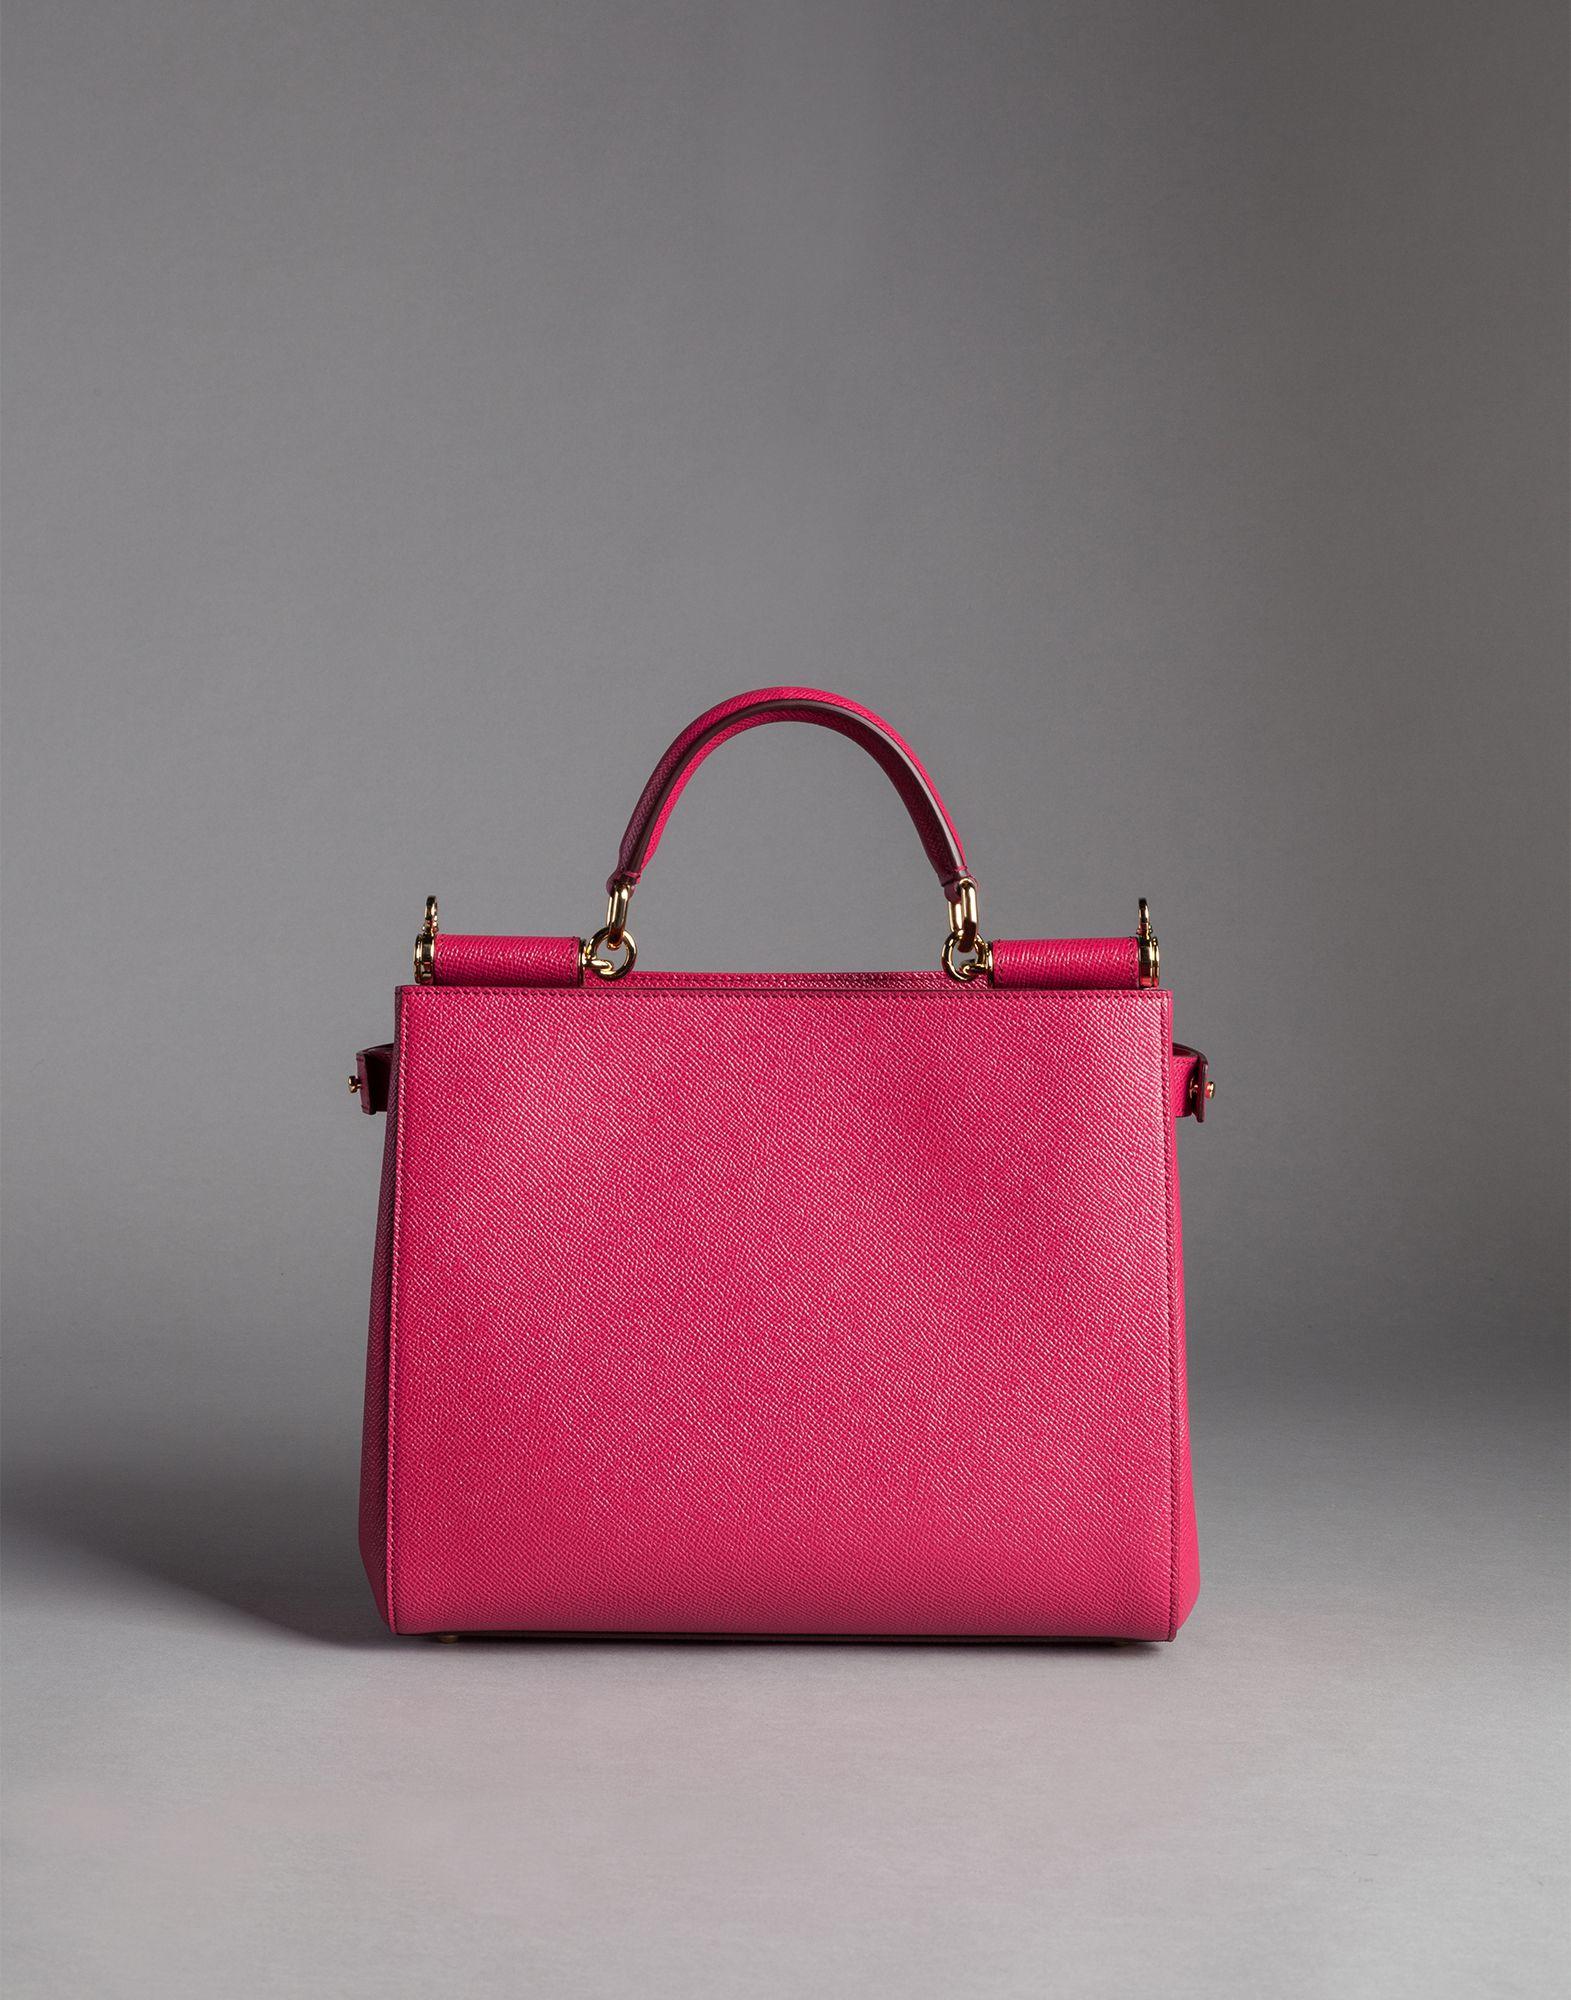 1674d04dd0d5 Dolce   Gabbana Dauphine Calfskin Sicily Shopping Bag in Pink - Lyst